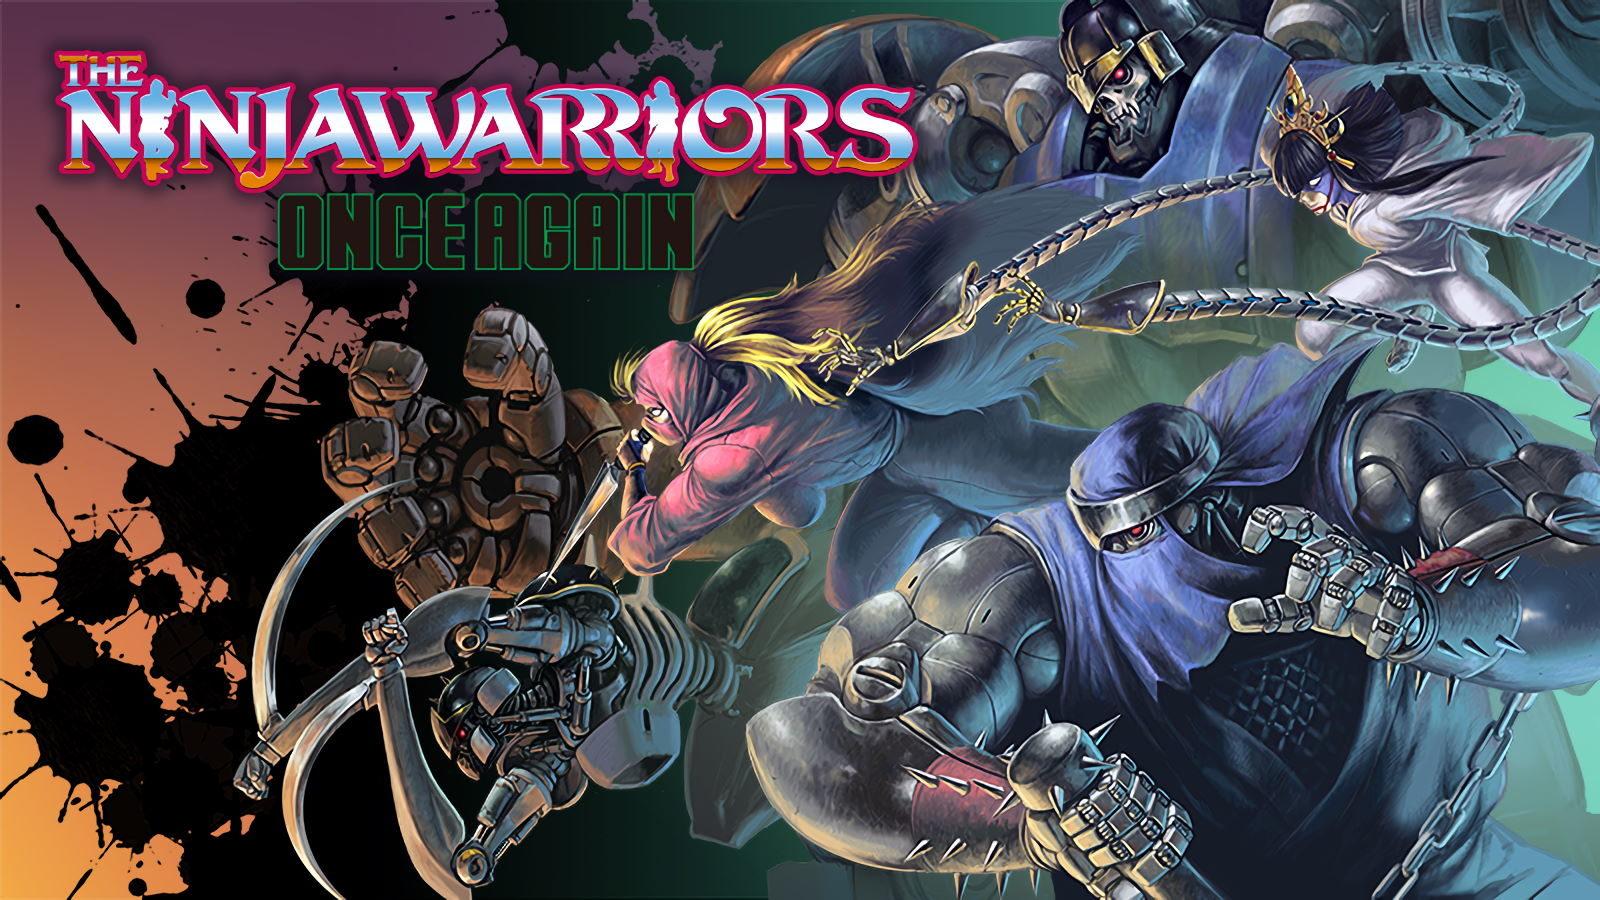 Test : The Ninja Warriors Once Again 3